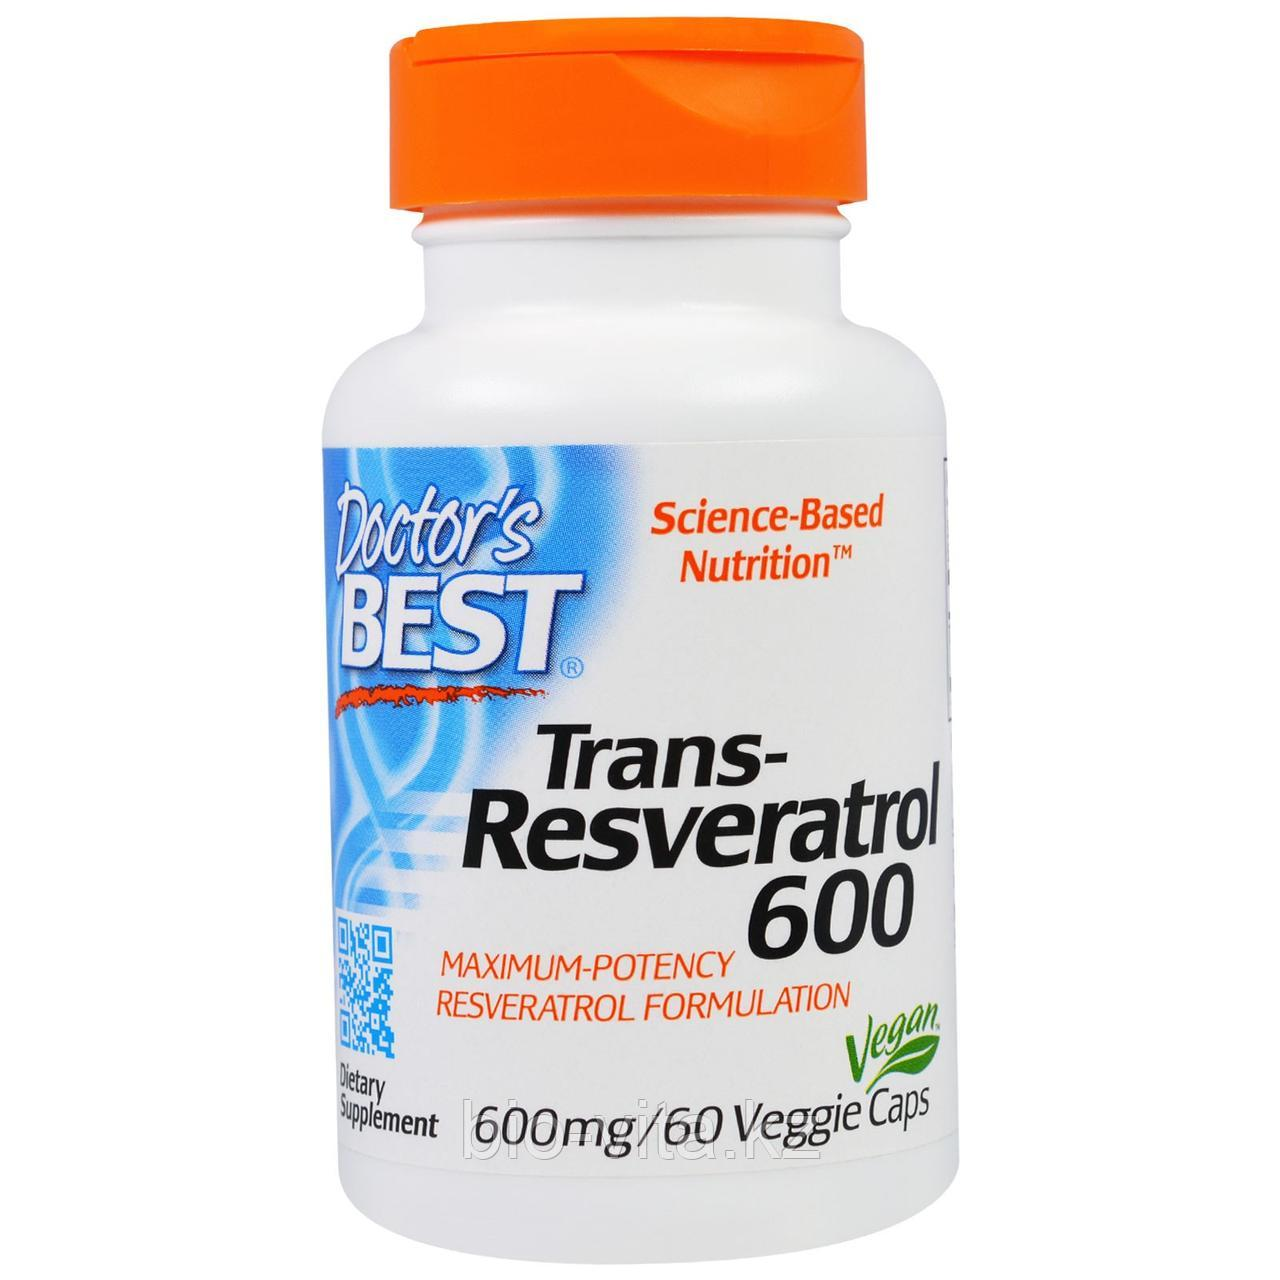 Doctor's Best, Лучший транс-ресвератрол 600, 600 мг, 60 капсул.